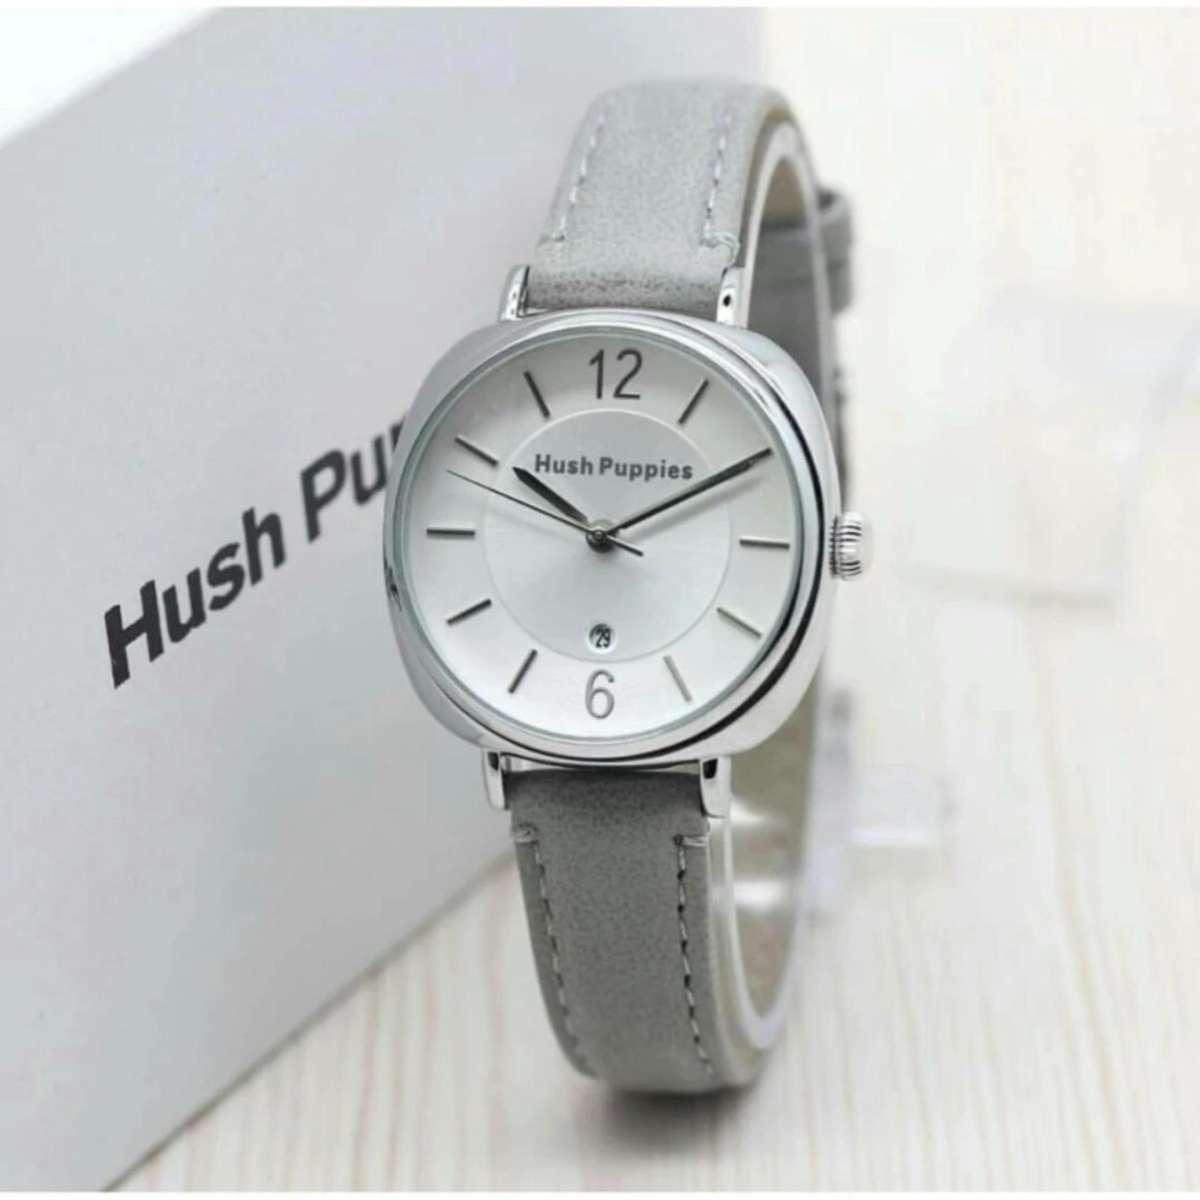 Jam tangan wanita hush-pupies Ellegant silver style - Leather Strap 83a035b3d5